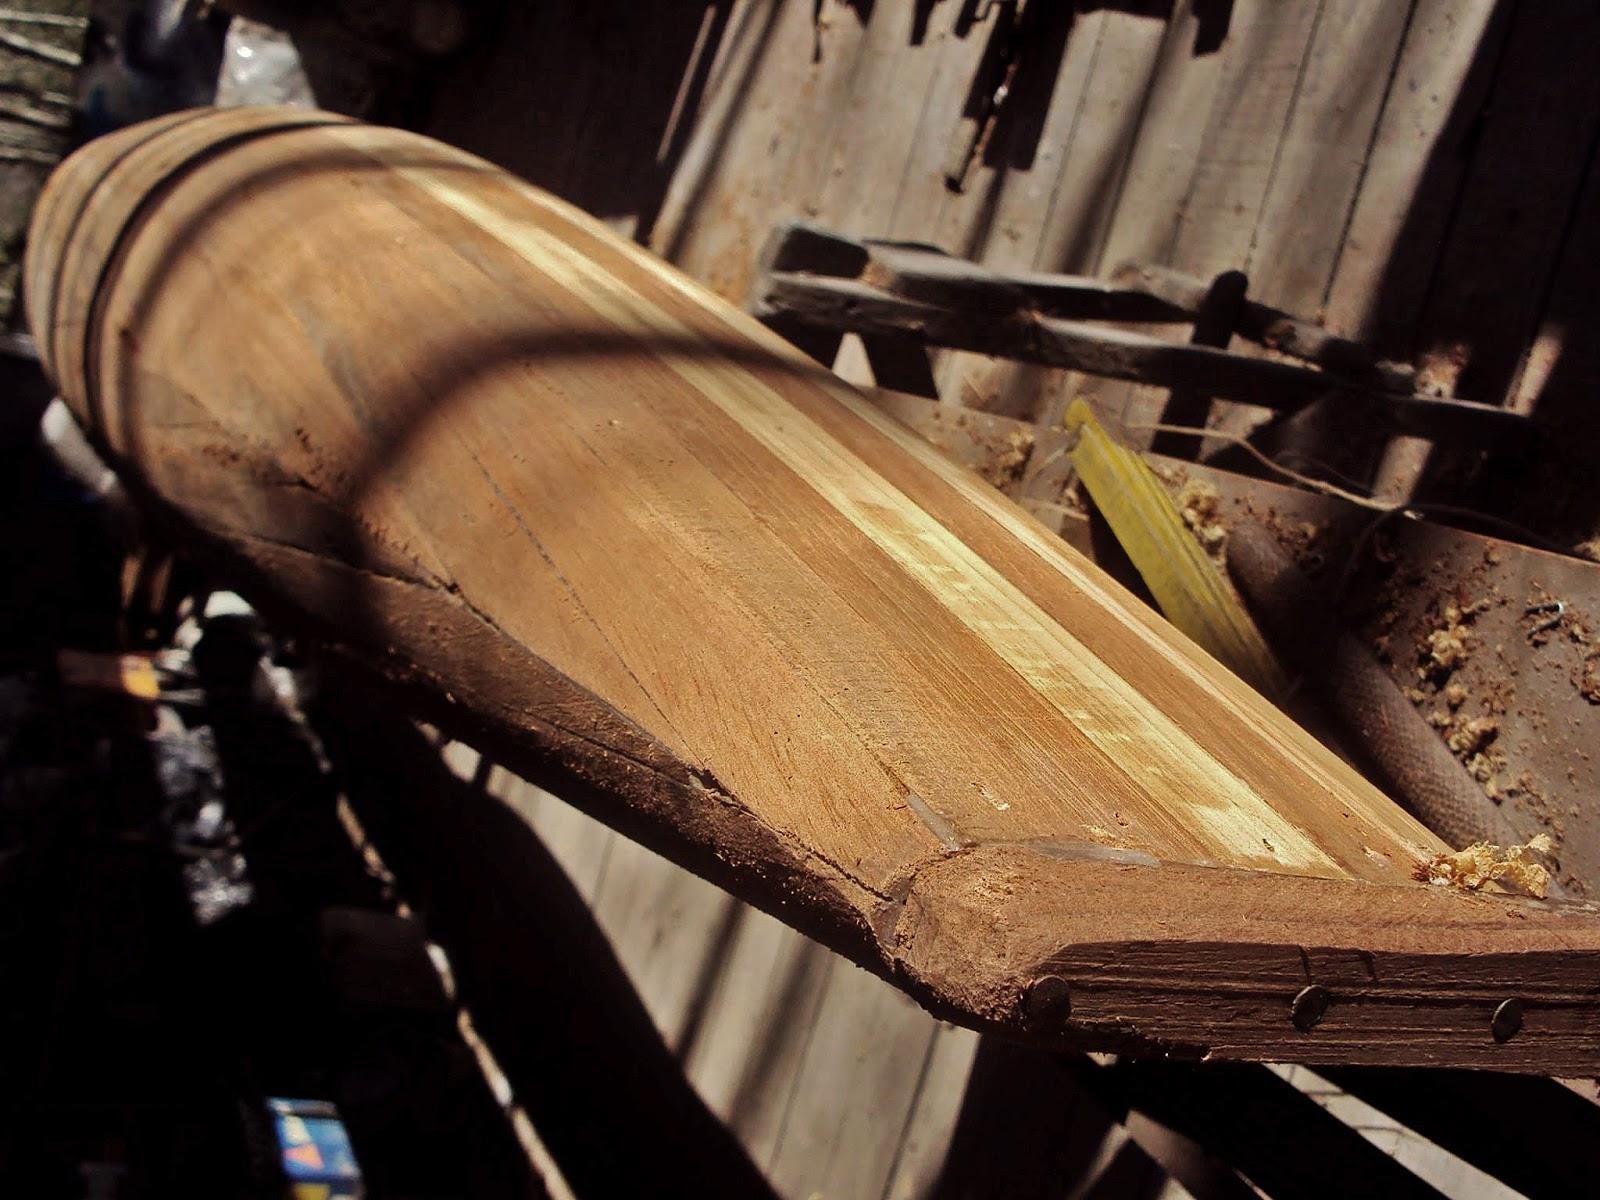 MV605 Surfski design: Model Wood Work – Catamaran Racing